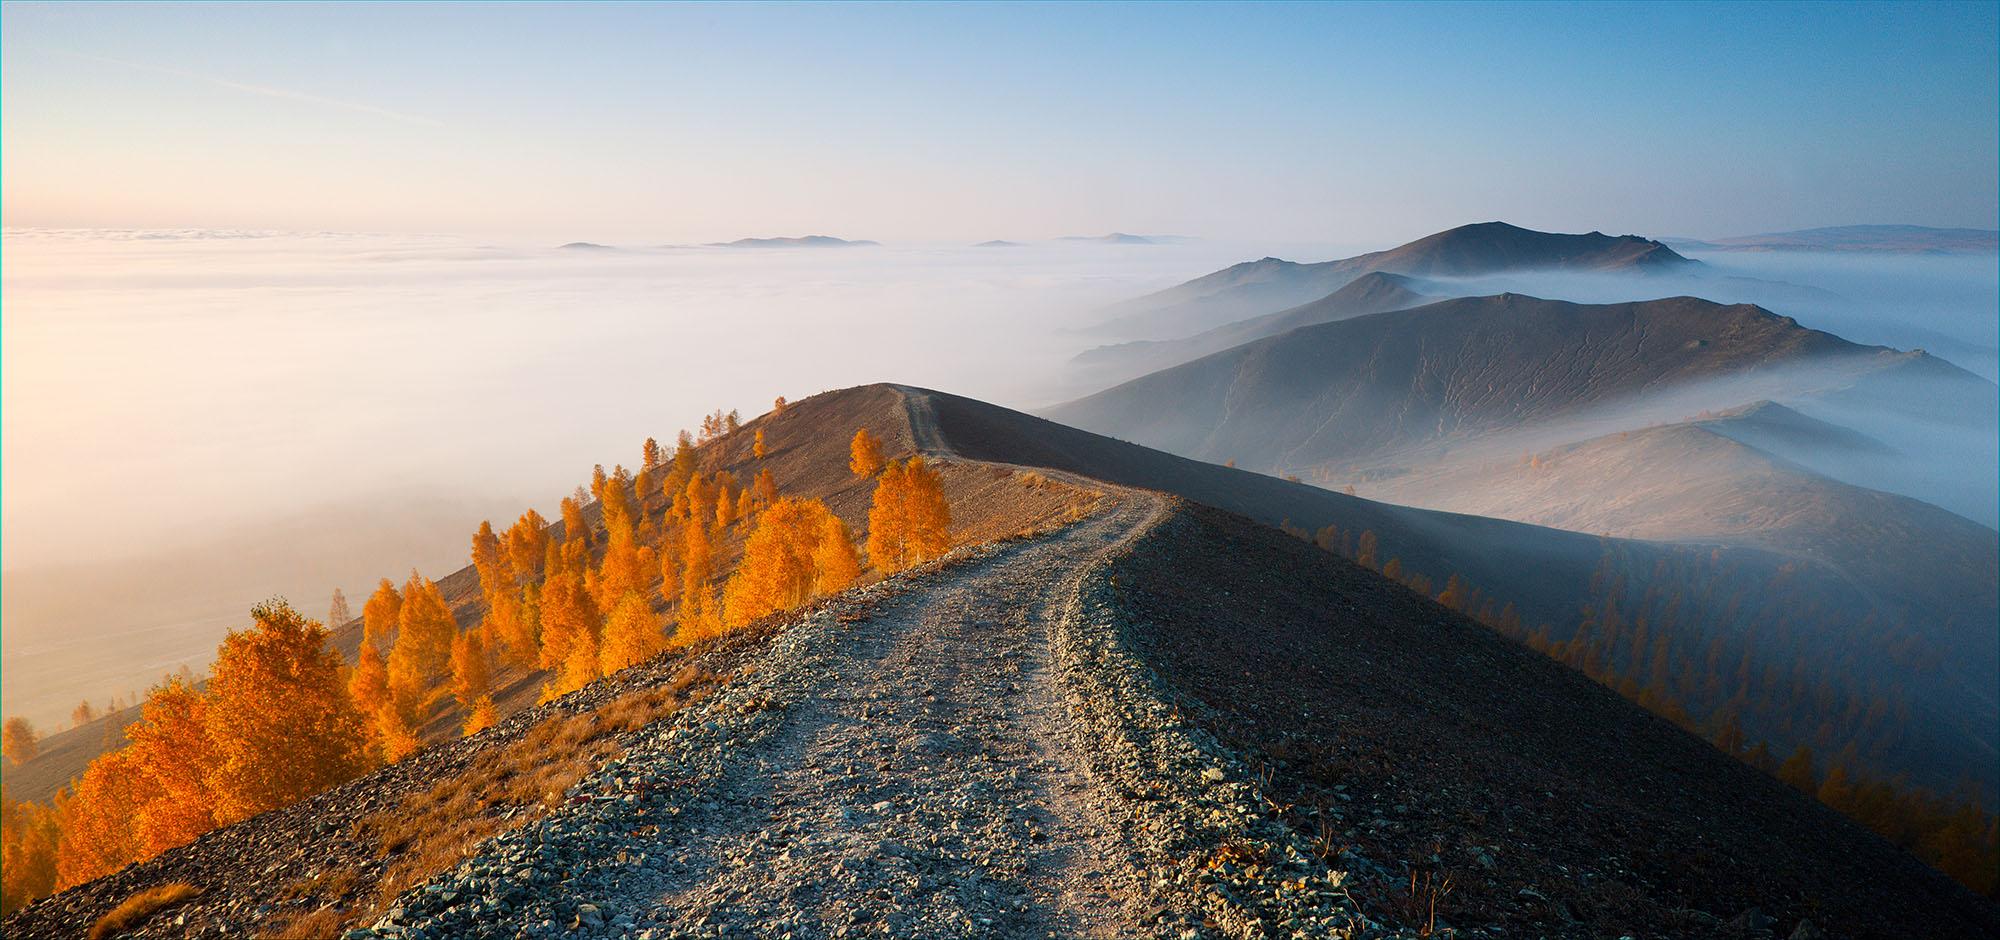 Sunrise at Karabash Mountain, South Urals, Russia - September 2014 ----------------------- Утро на горе Карабаш, Южный Урал, Россия - Сентябрь 2014